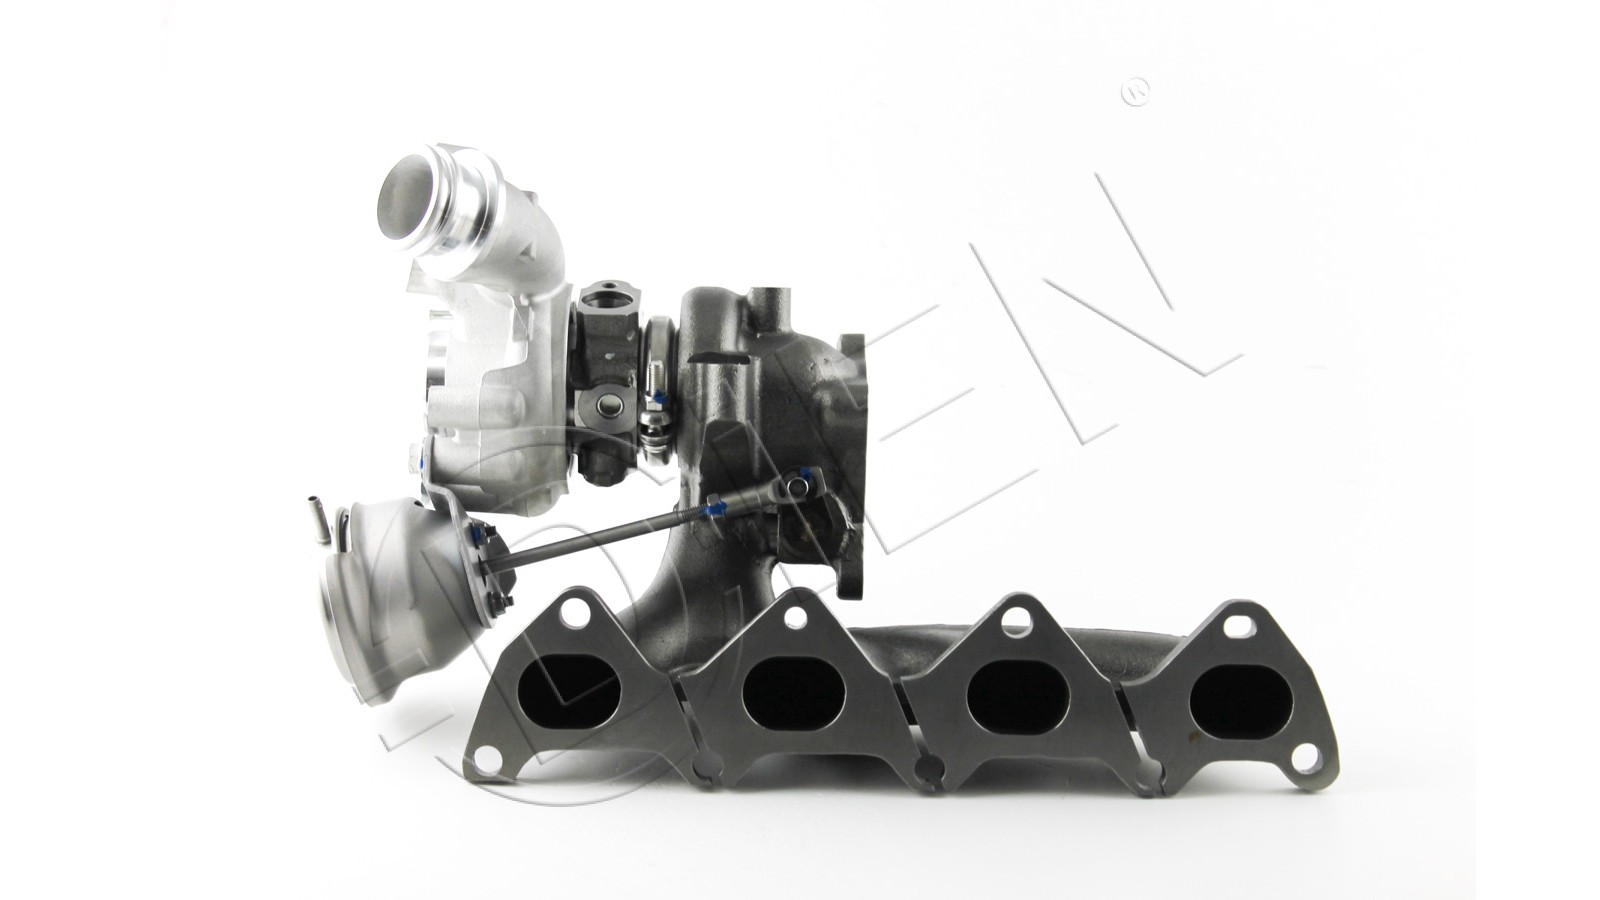 Turbocompressore rigenerato per VOLKSWAGEN GOLF V 1.4 TSI 122Cv